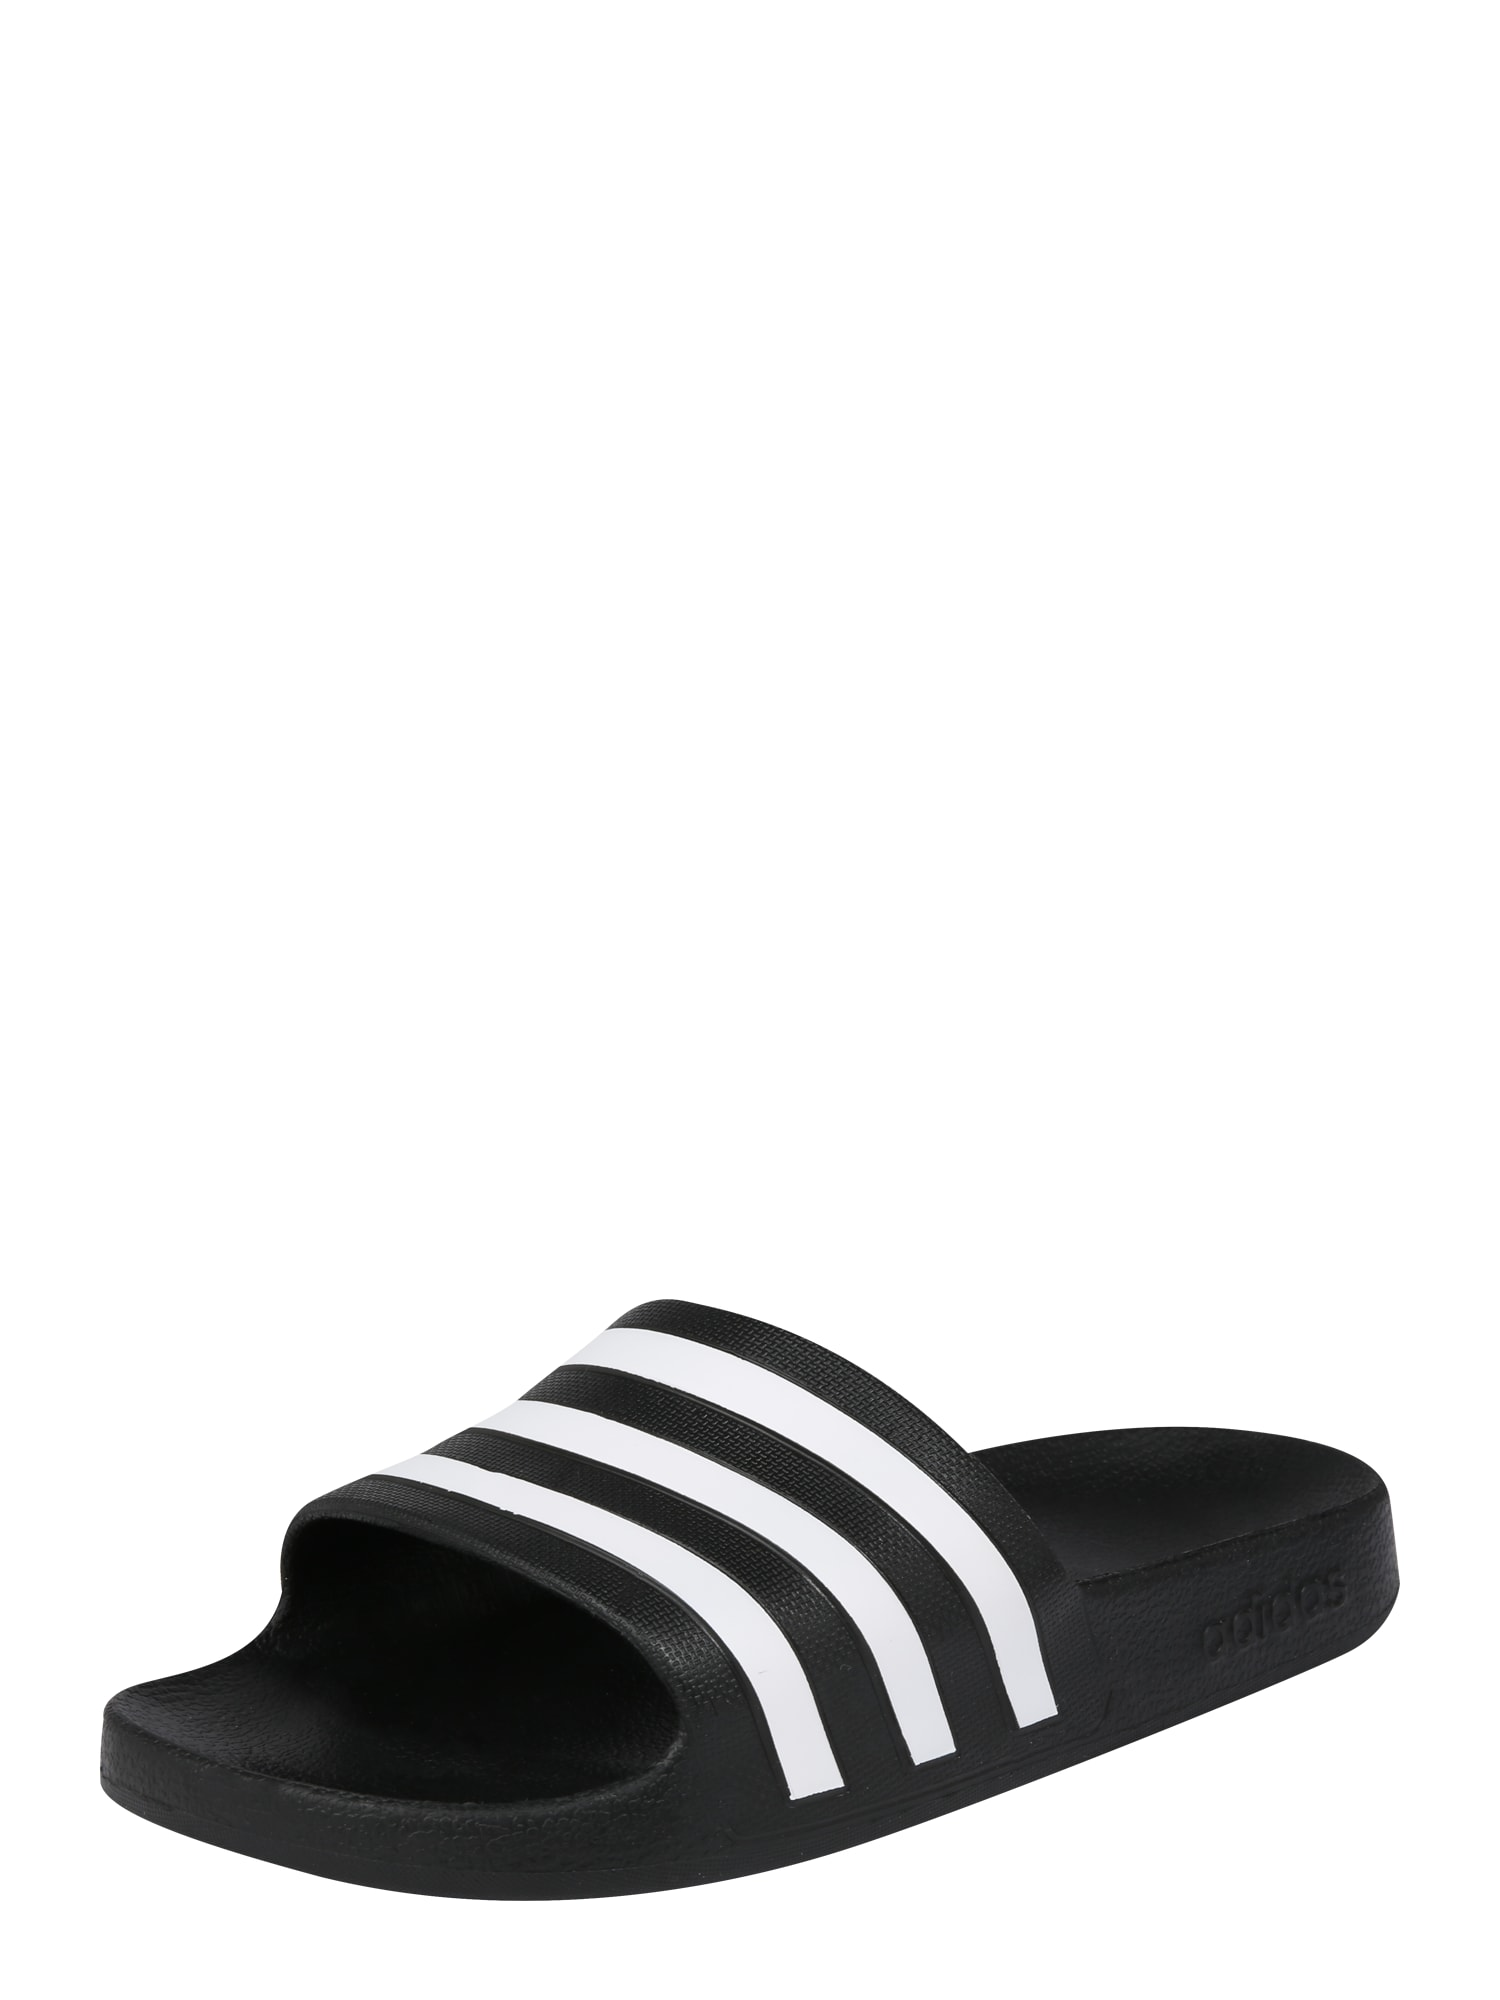 ADIDAS PERFORMANCE Sandalai / maudymosi batai 'AQUA' juoda / balta